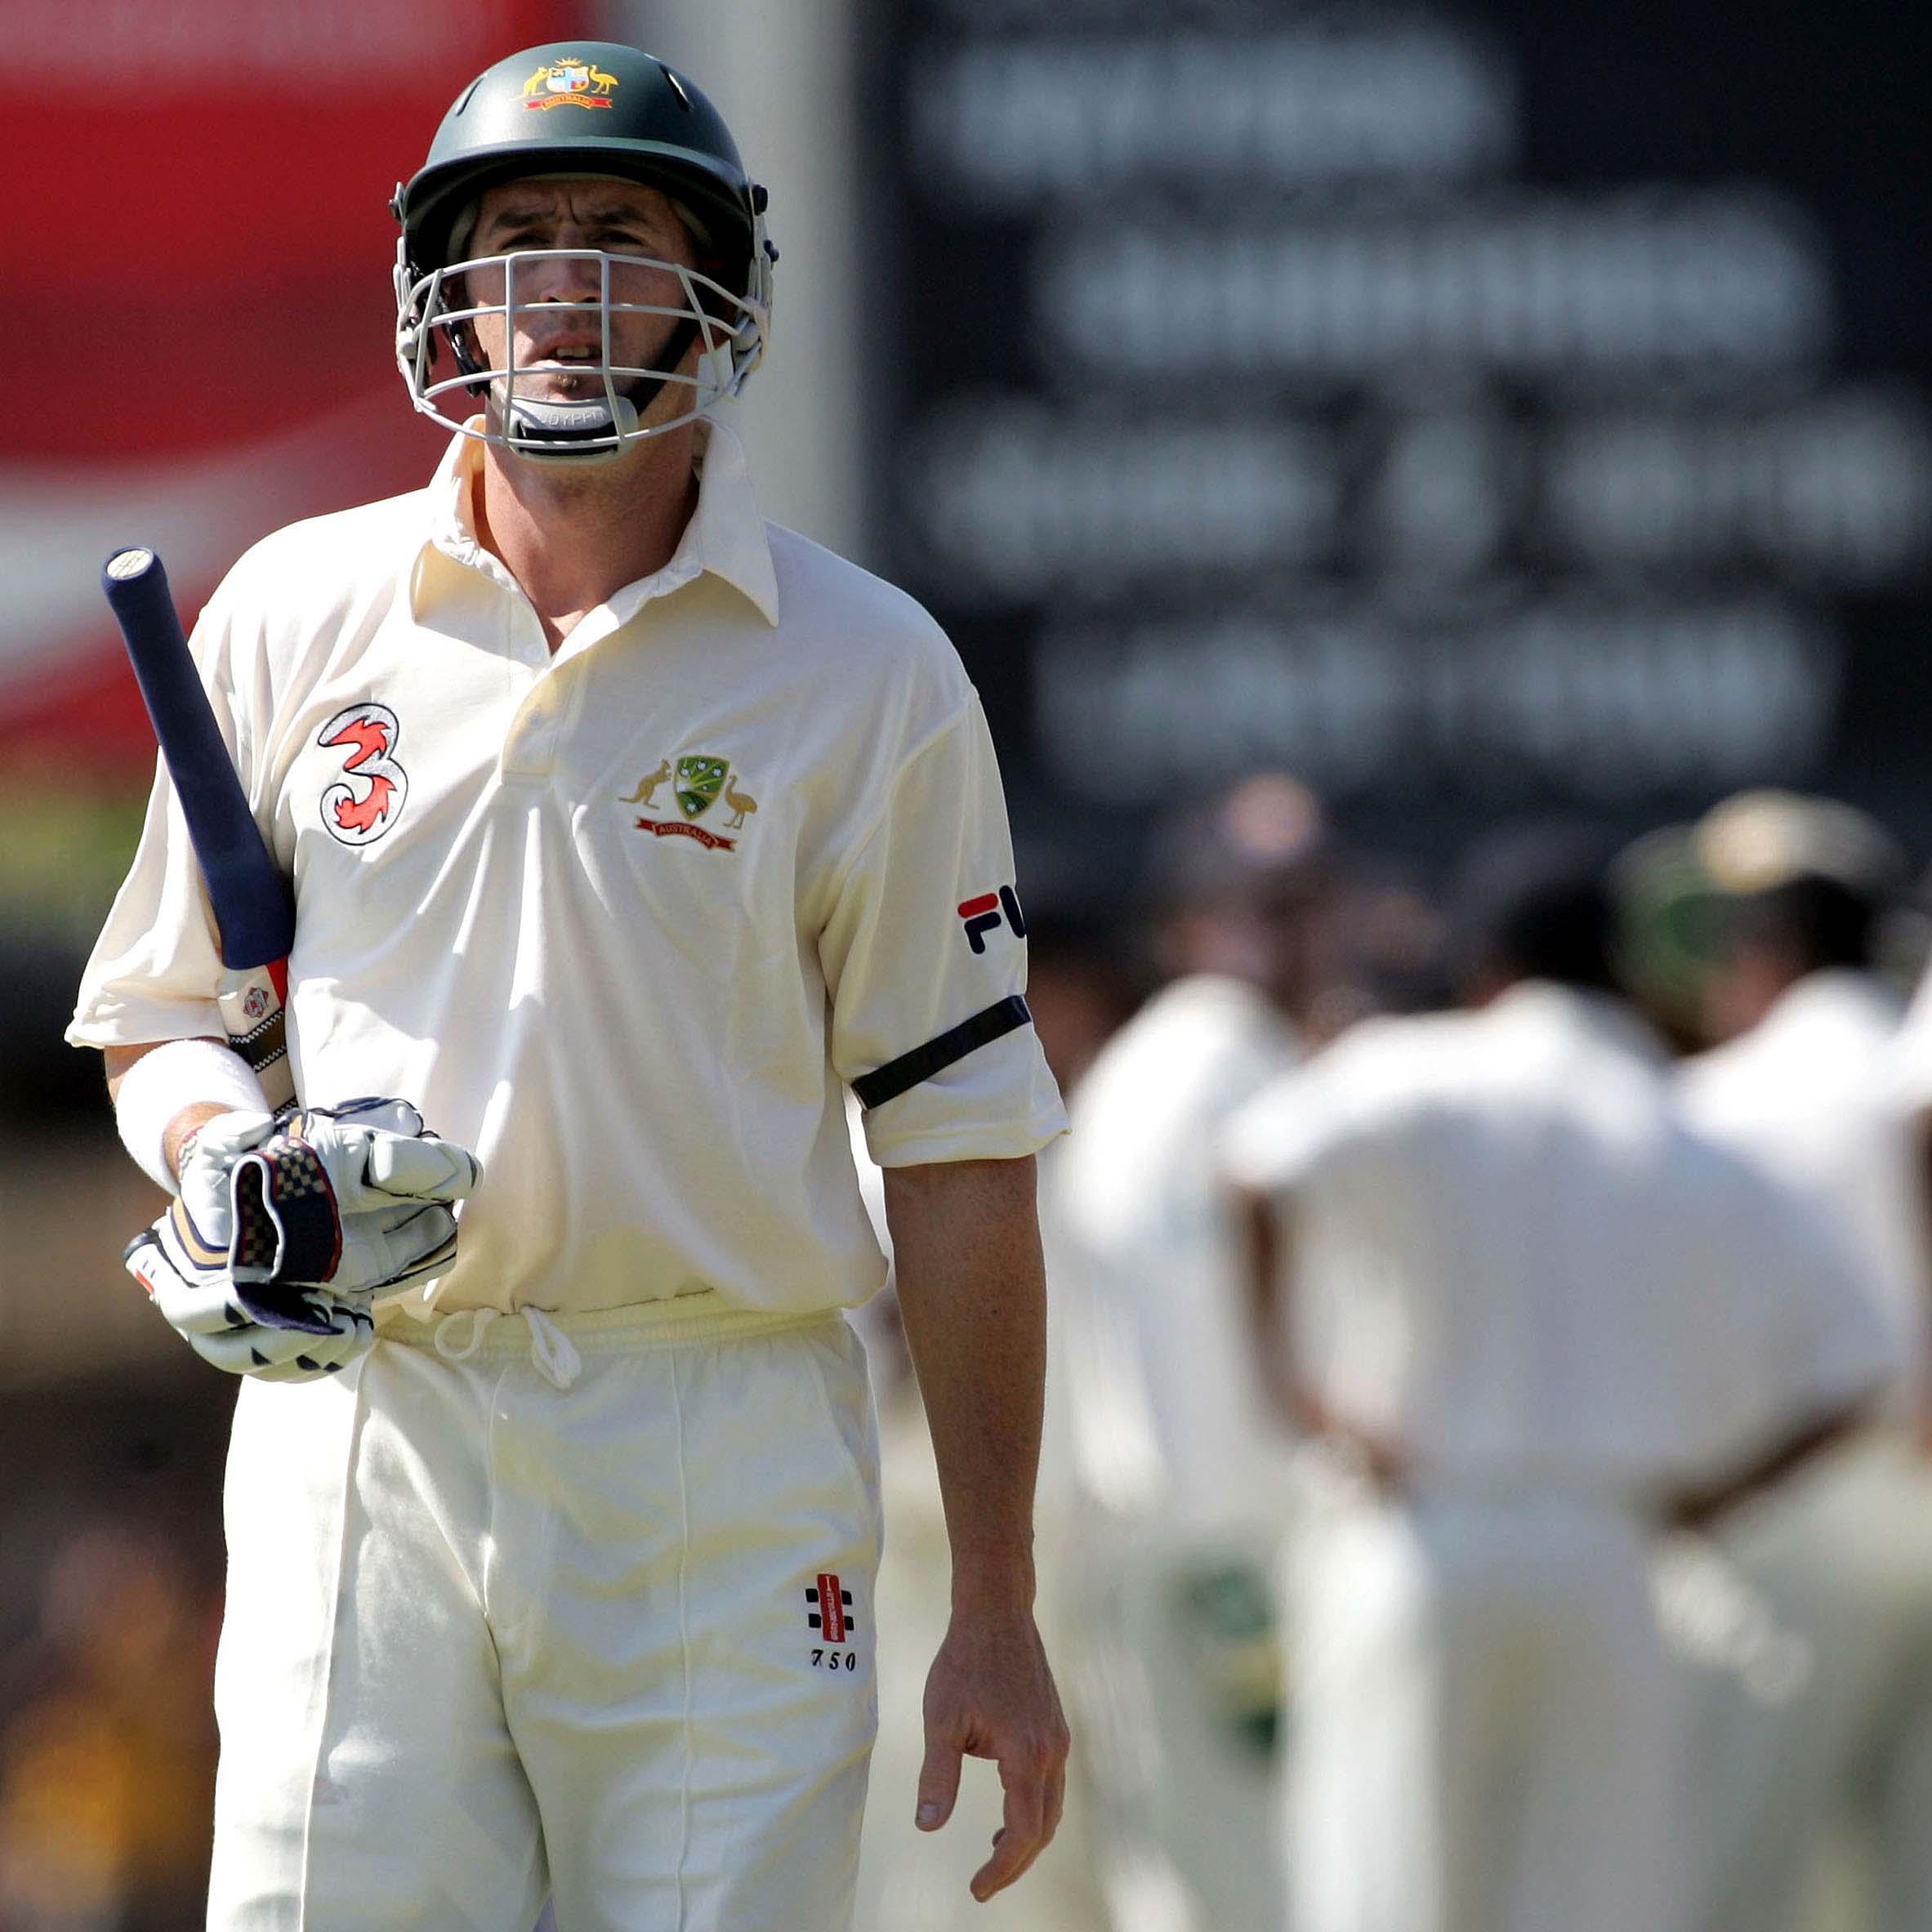 Elliott was recalled for one final Test match in 2004 // Getty